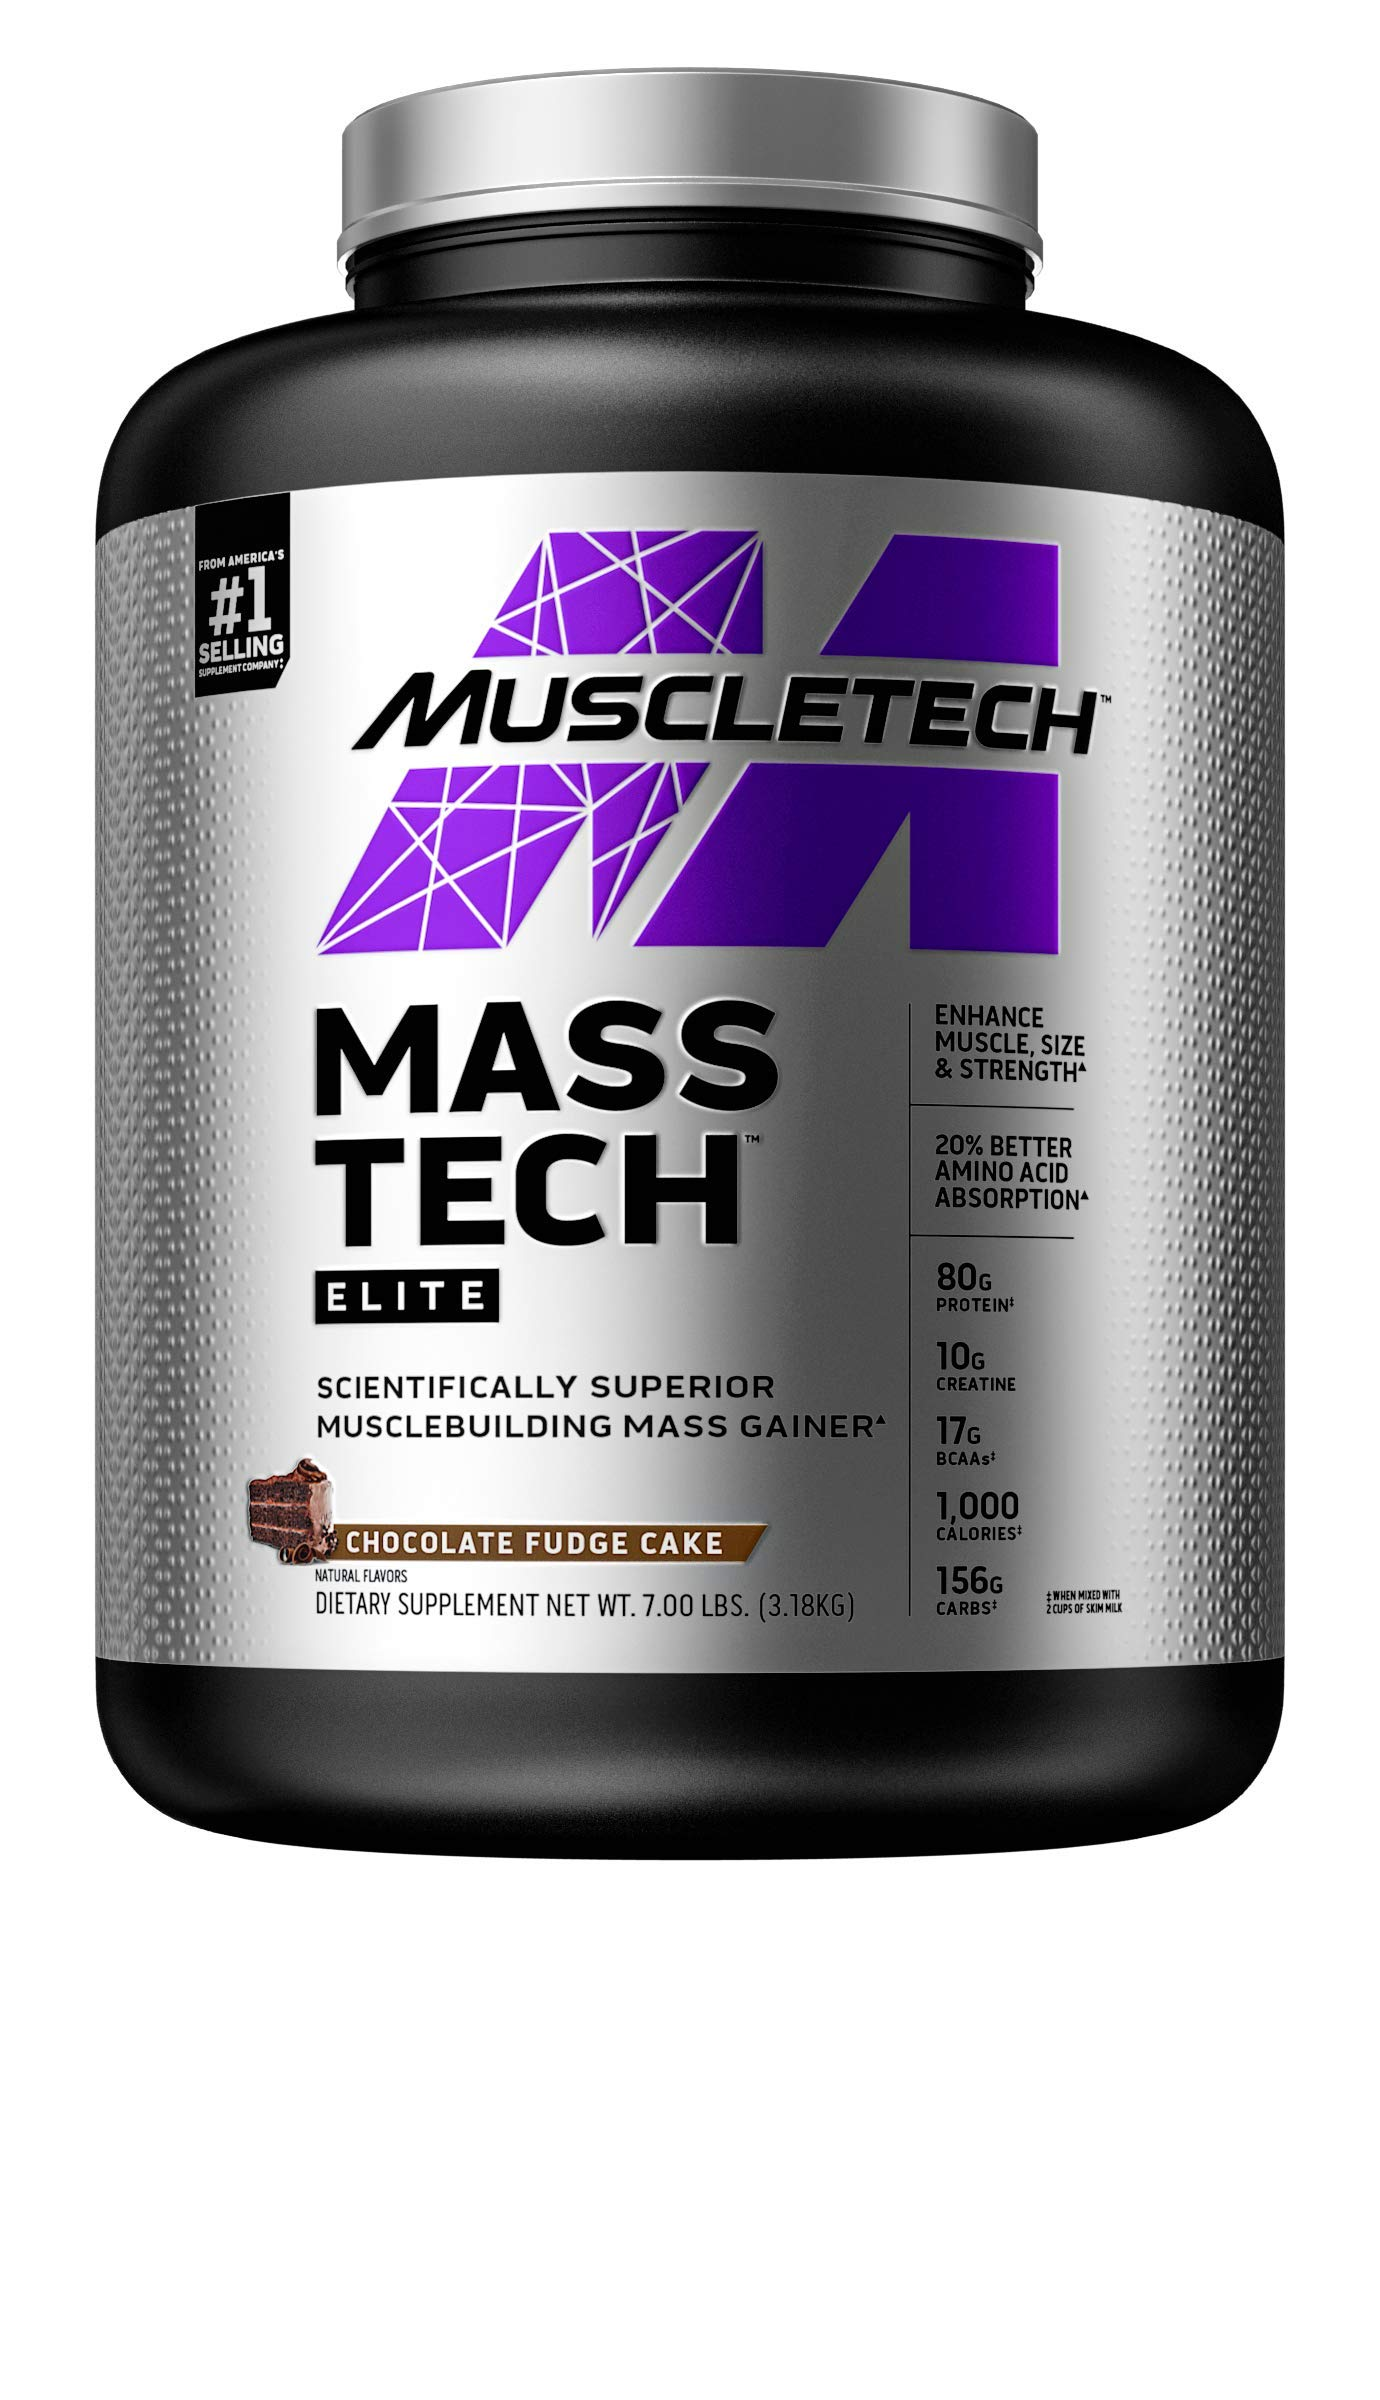 Mass Gainer Protein Powder   MuscleTech Mass-Tech Elite Mass Gainer   Whey Protein Powder + Muscle Builder   Weight Gainer   Protein Powder for Muscle Gain   Creatine Supplements   Chocolate, 7 lbs